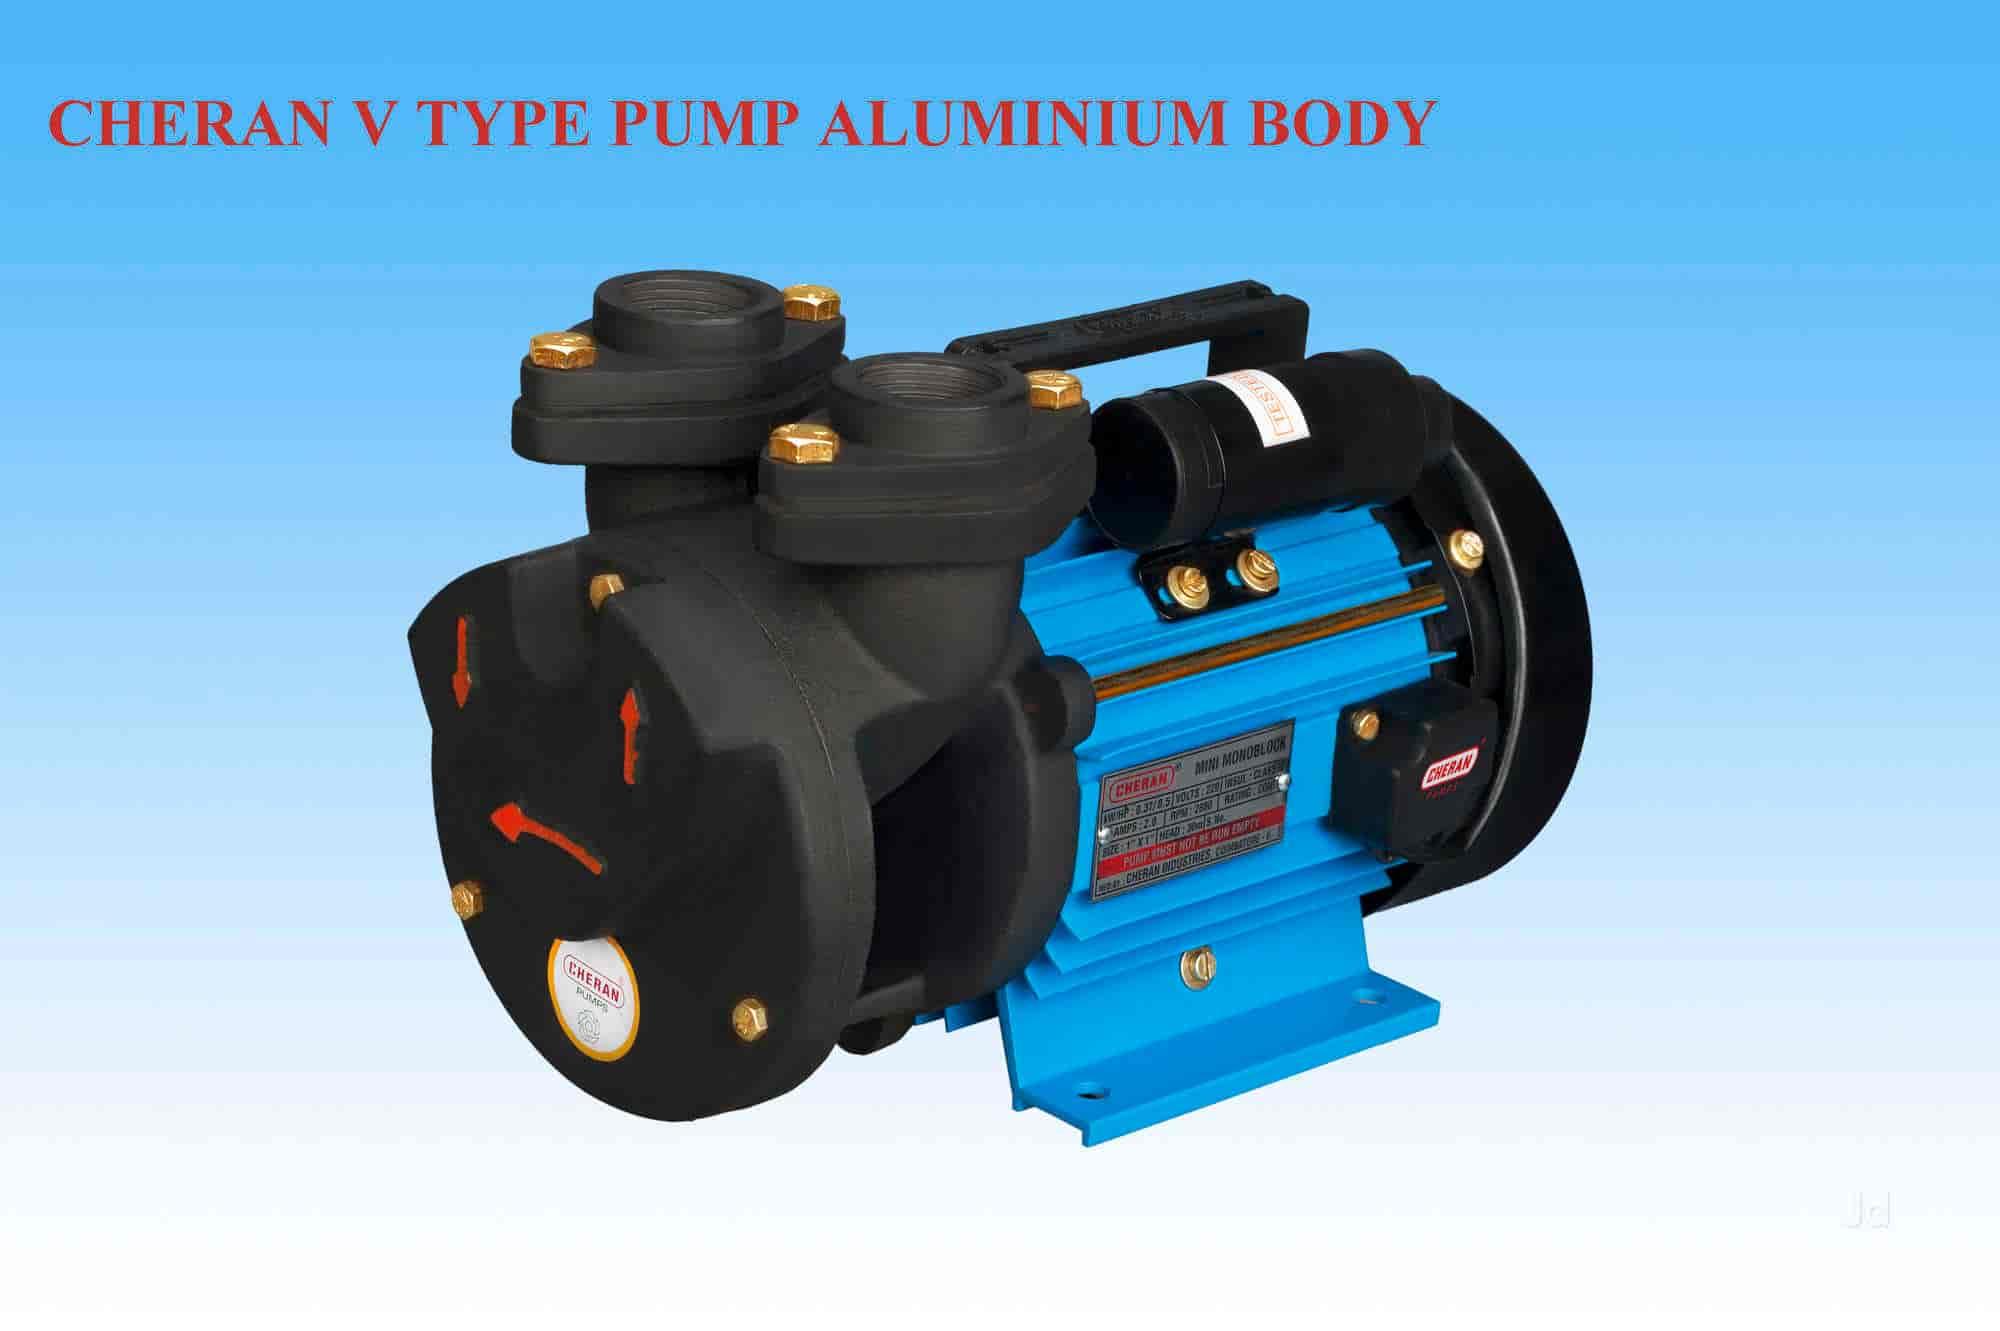 Cheran pumps